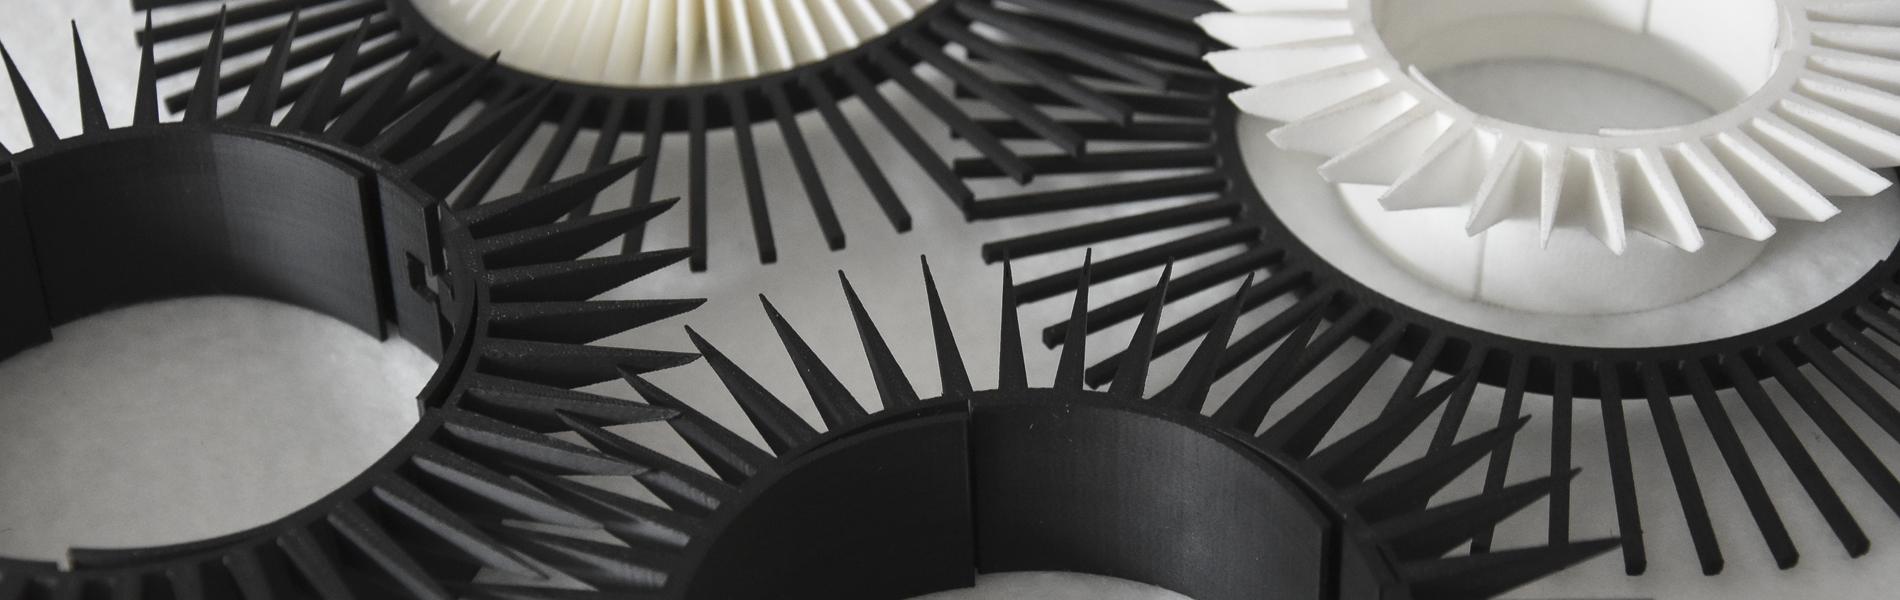 Additve manufactured winding pins